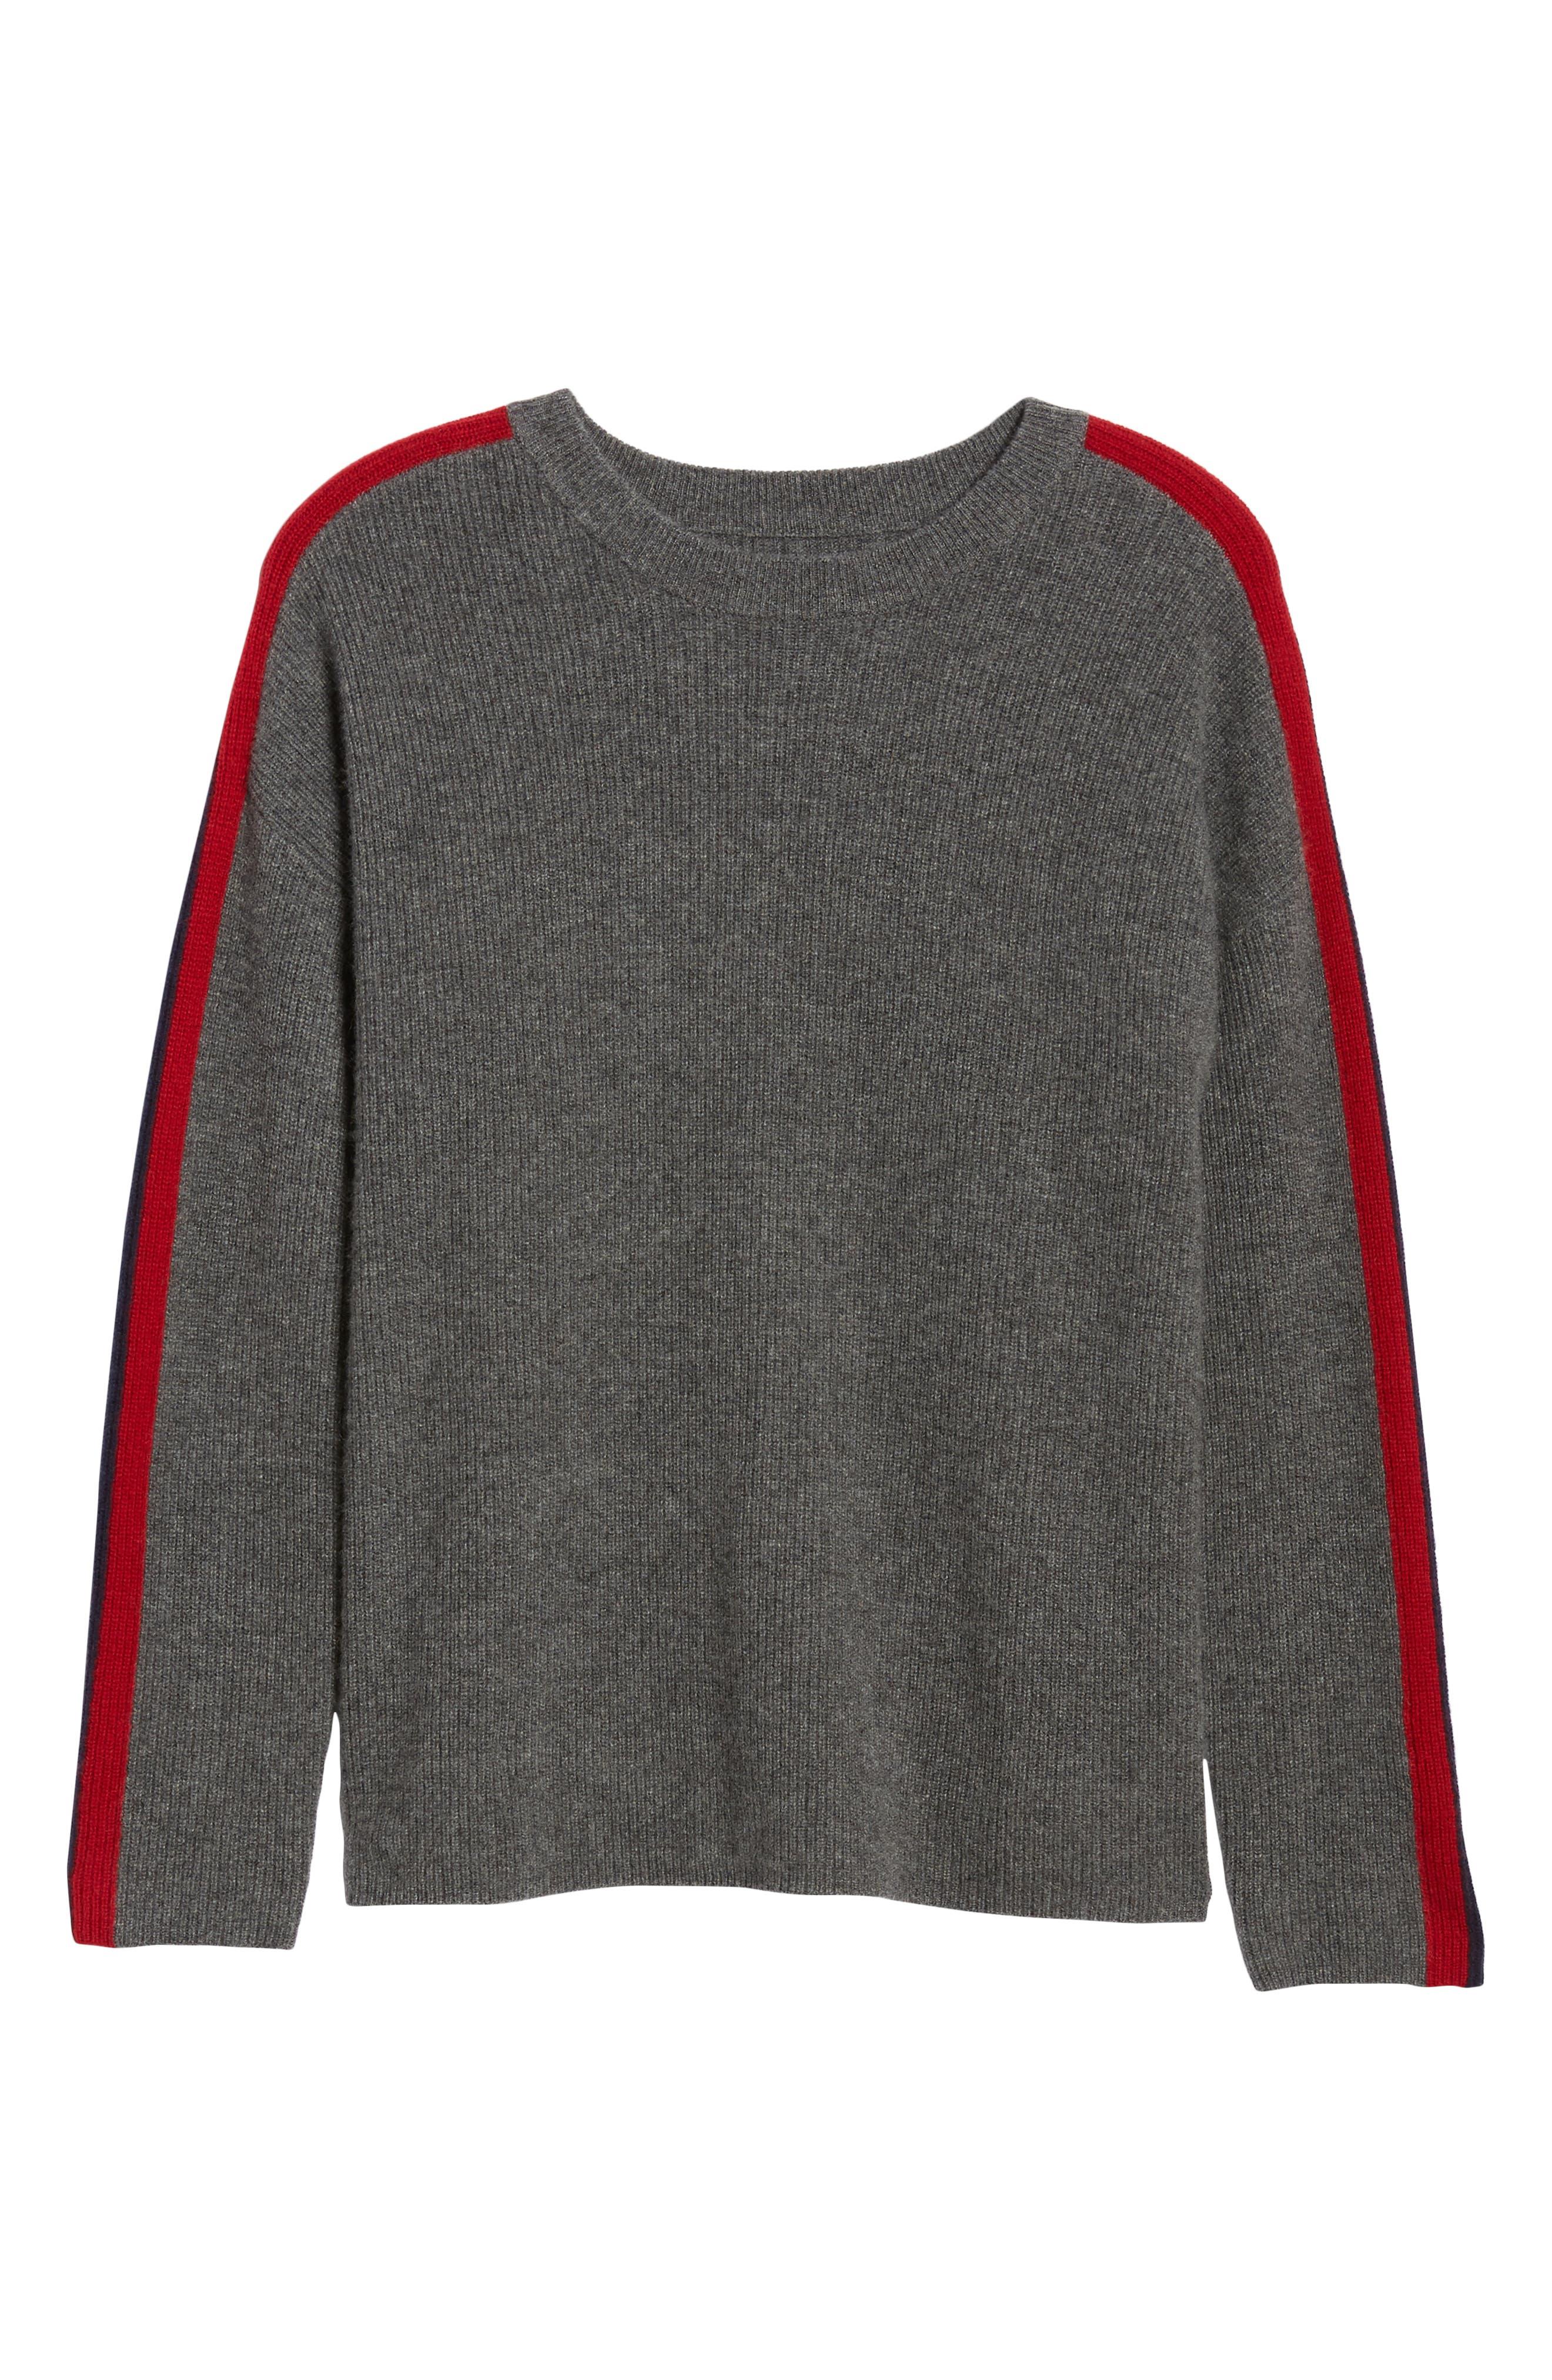 Stripe Sleeve Cashmere Sweater,                             Alternate thumbnail 6, color,                             DARK GREY